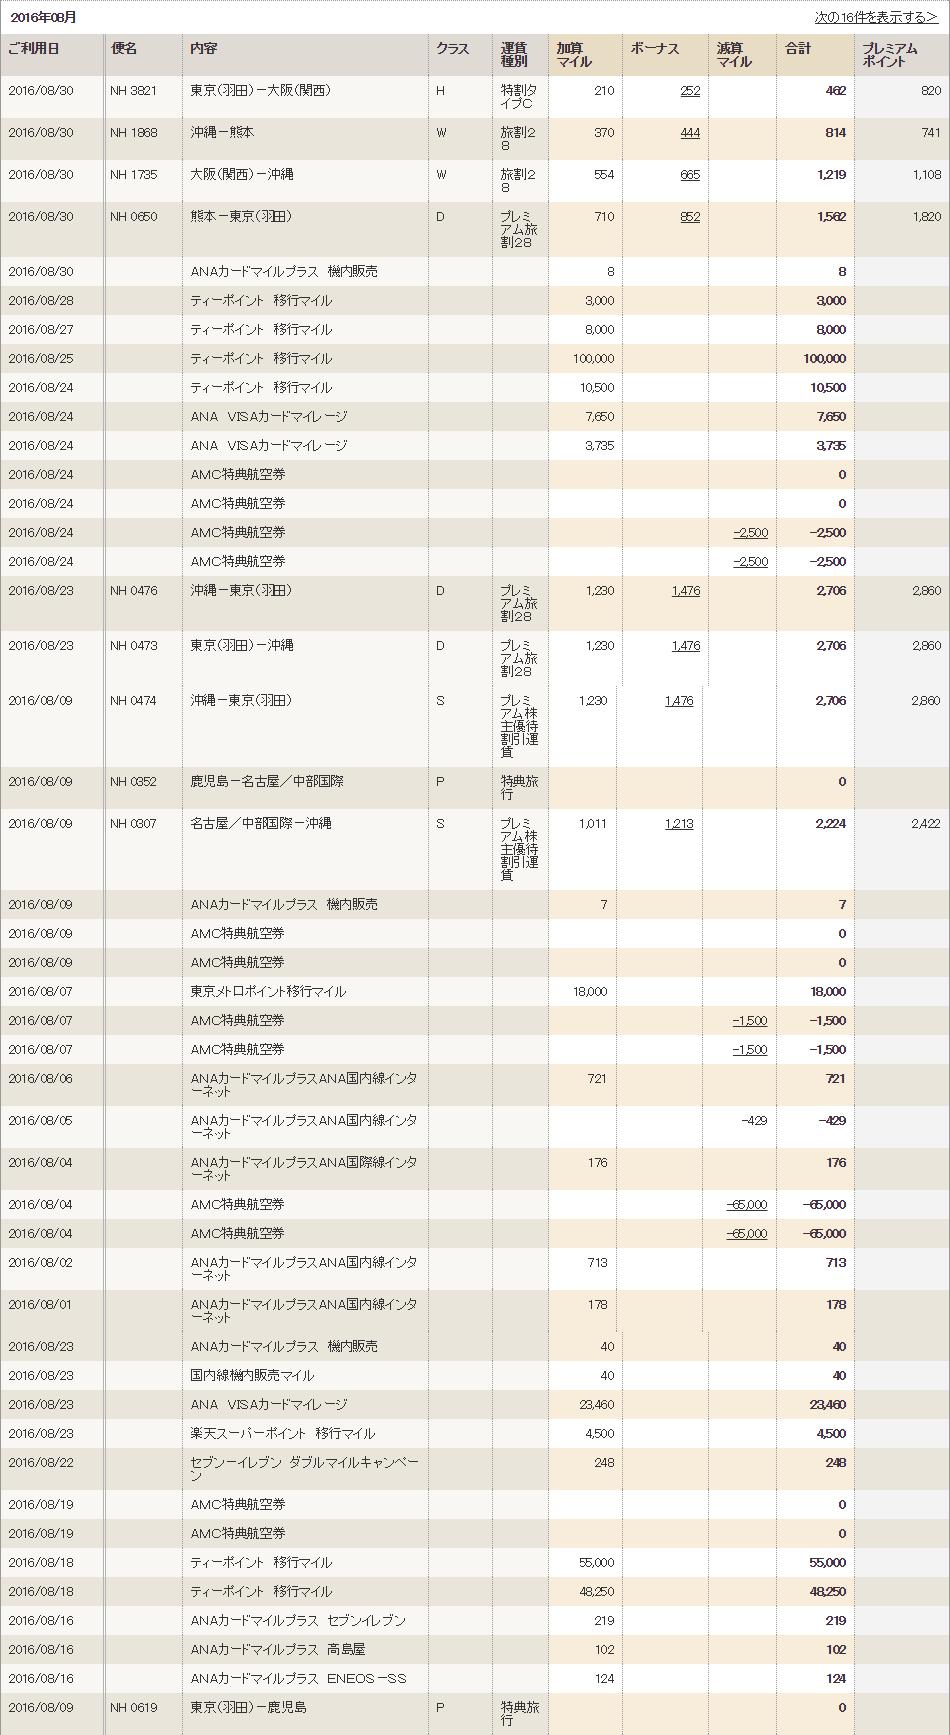 f:id:kowagari:20160928210753p:plain